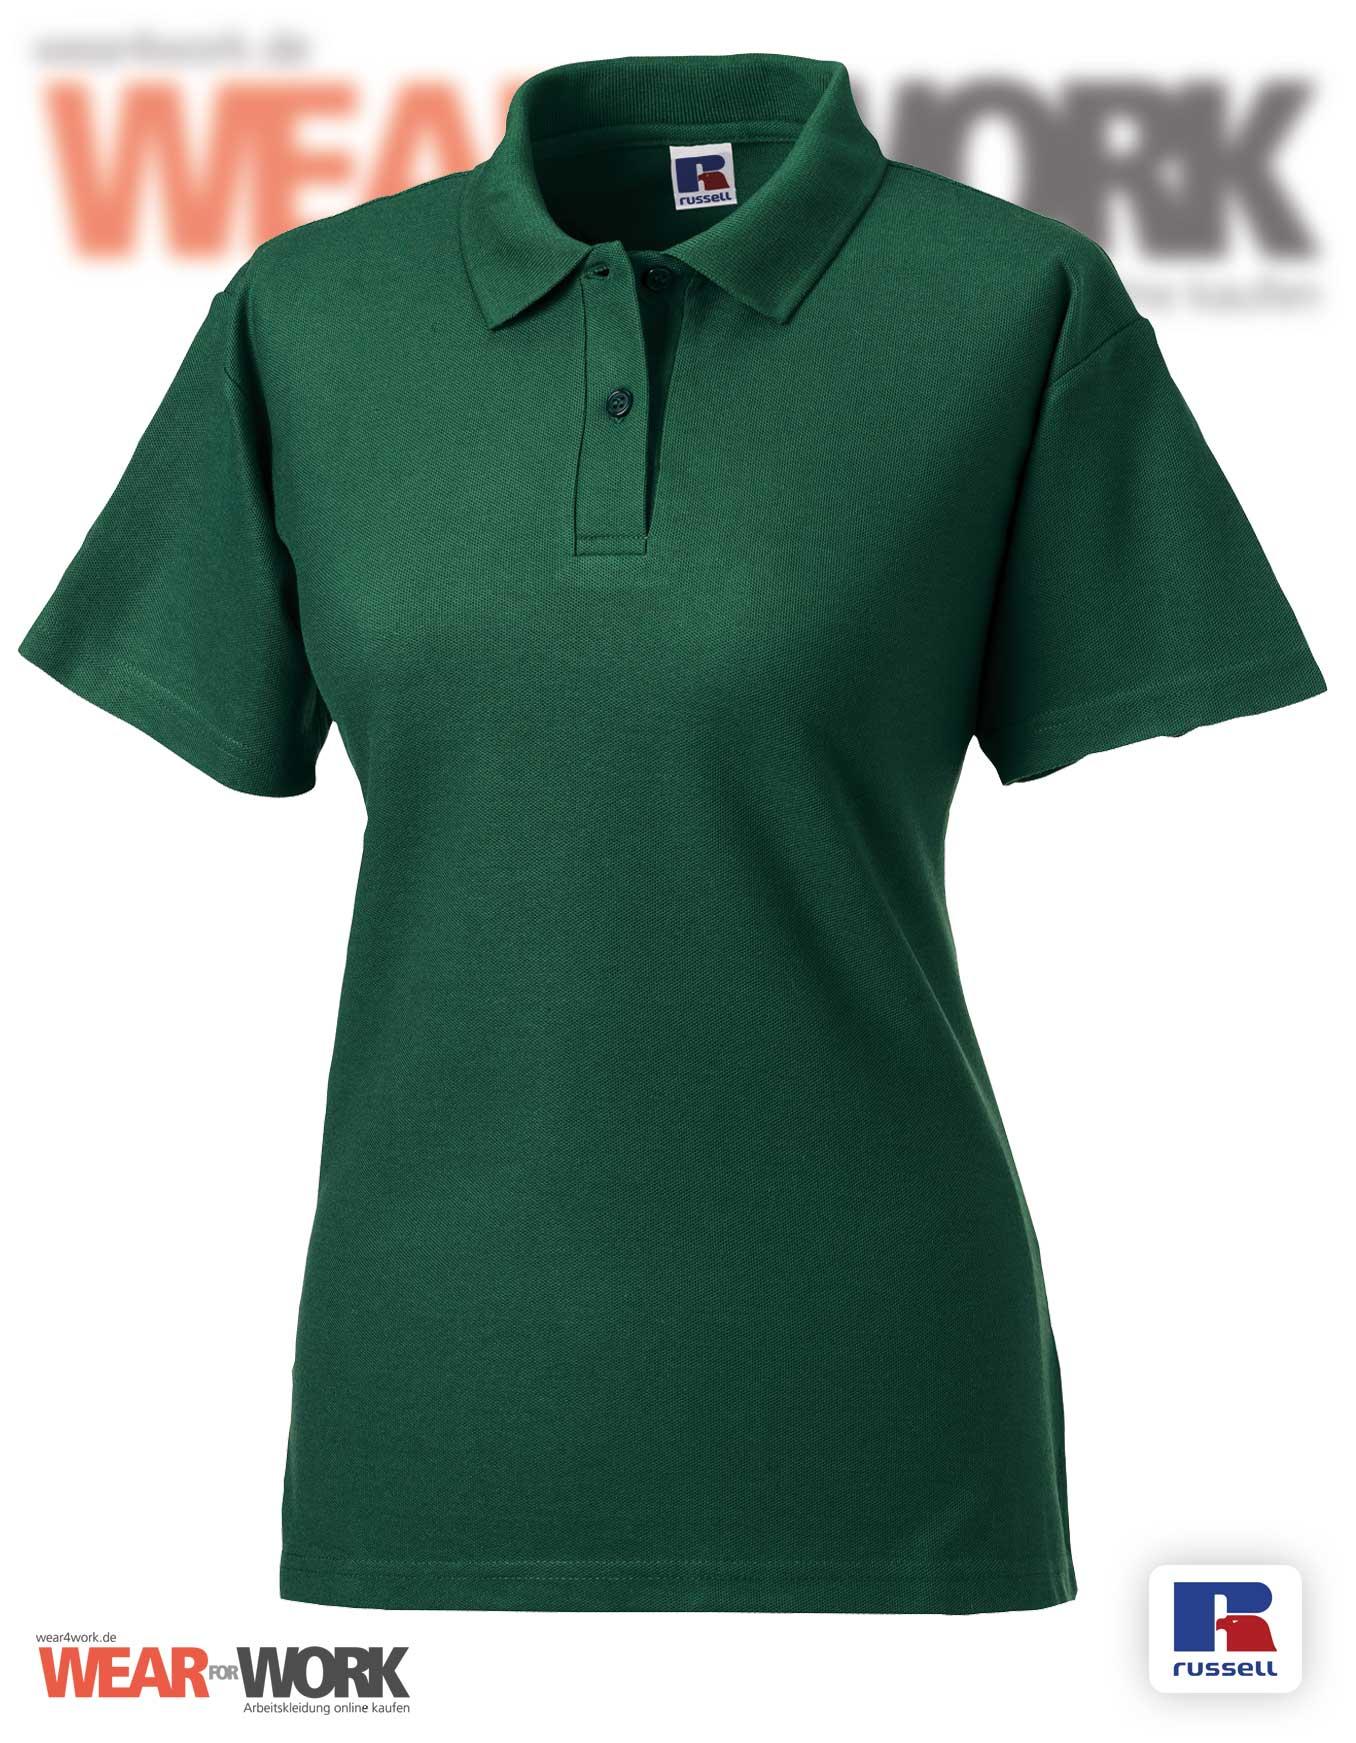 bc0280c5b1734 Workwear Polo-Shirt grün Damen R-539F Russell Europe